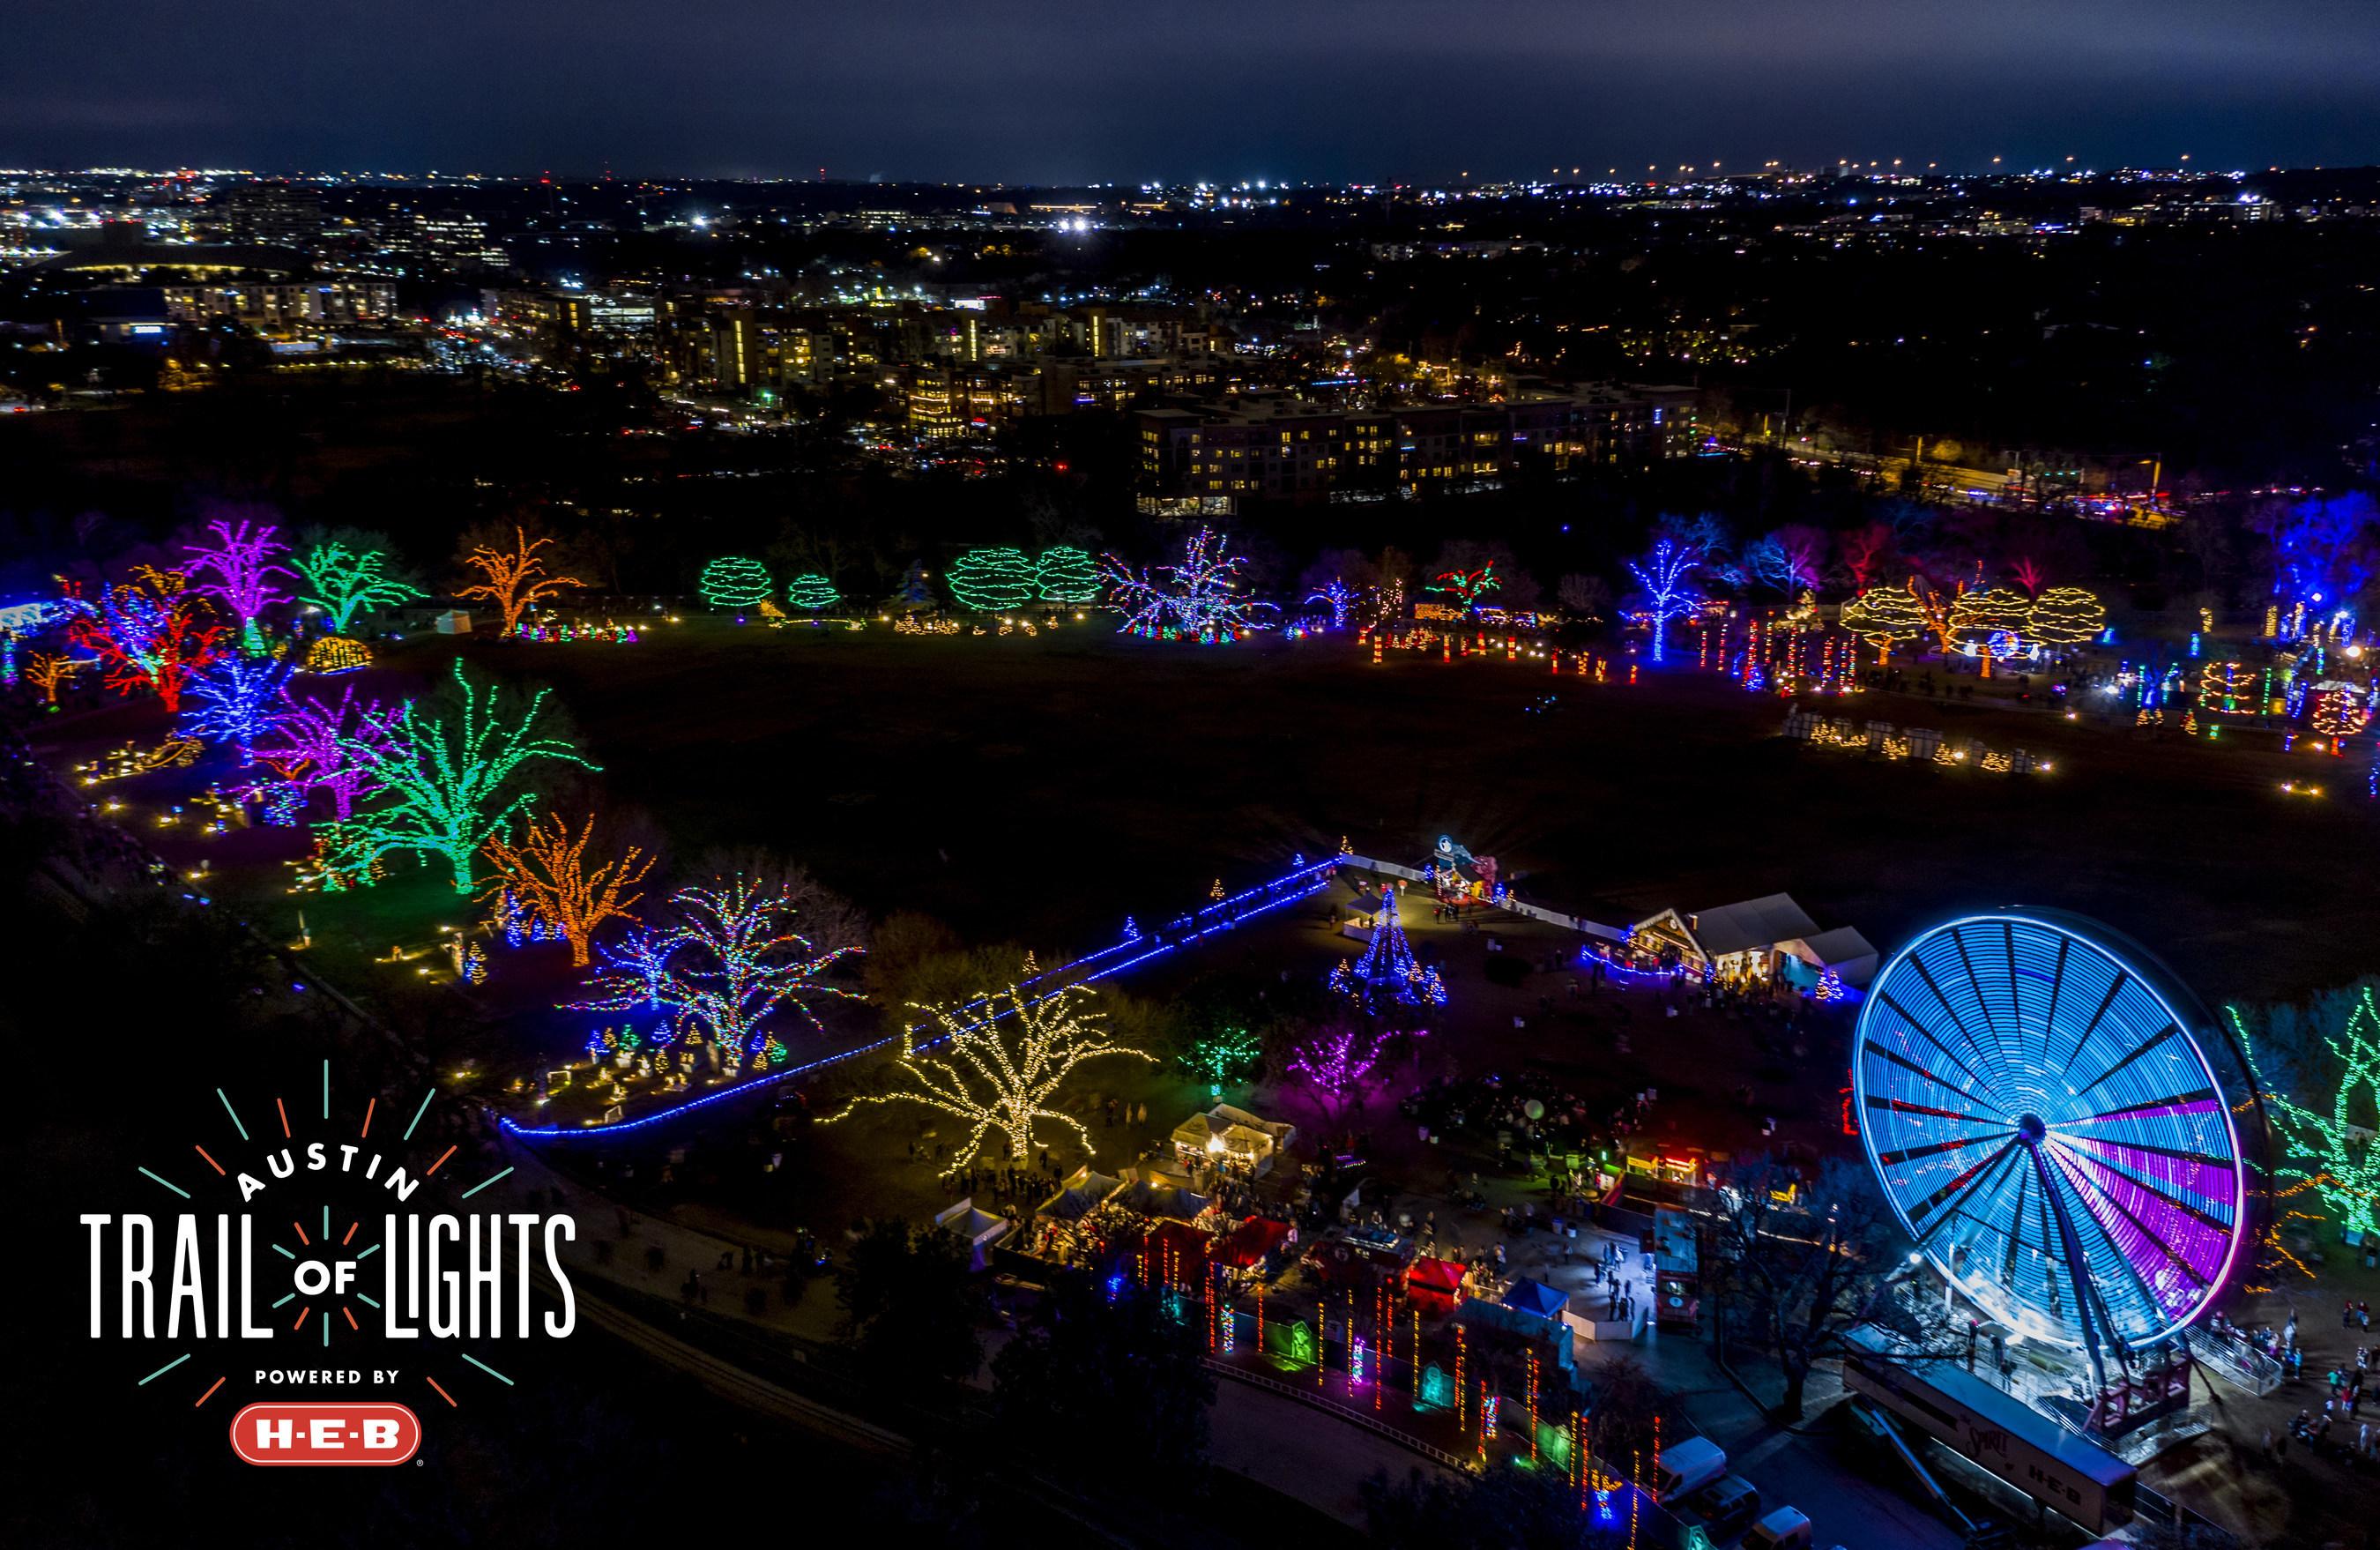 55th Annual Austin Trail of Lights, Powered by H-E-B